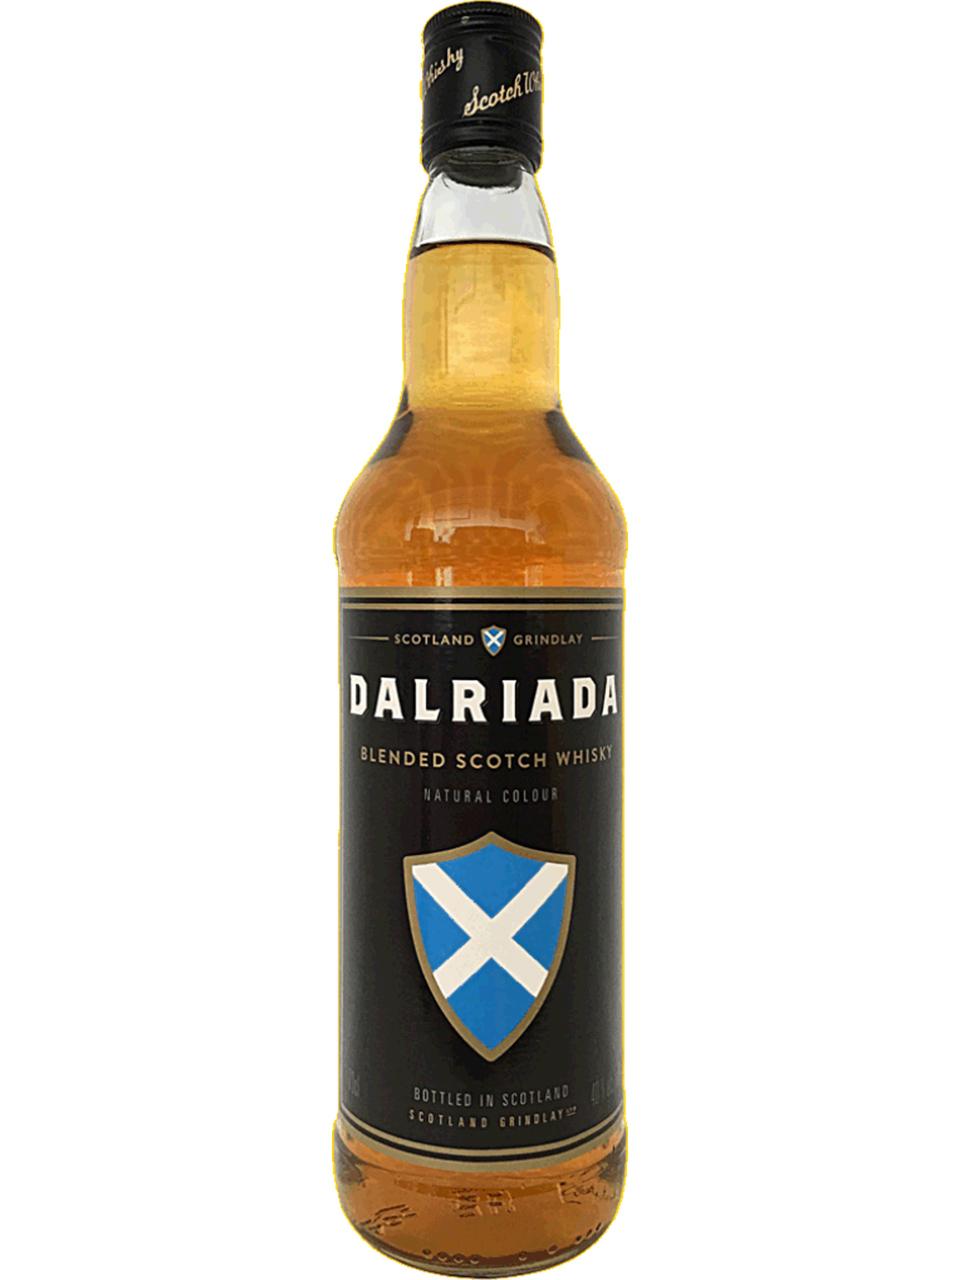 Dalriada Blended Scotch Whisky